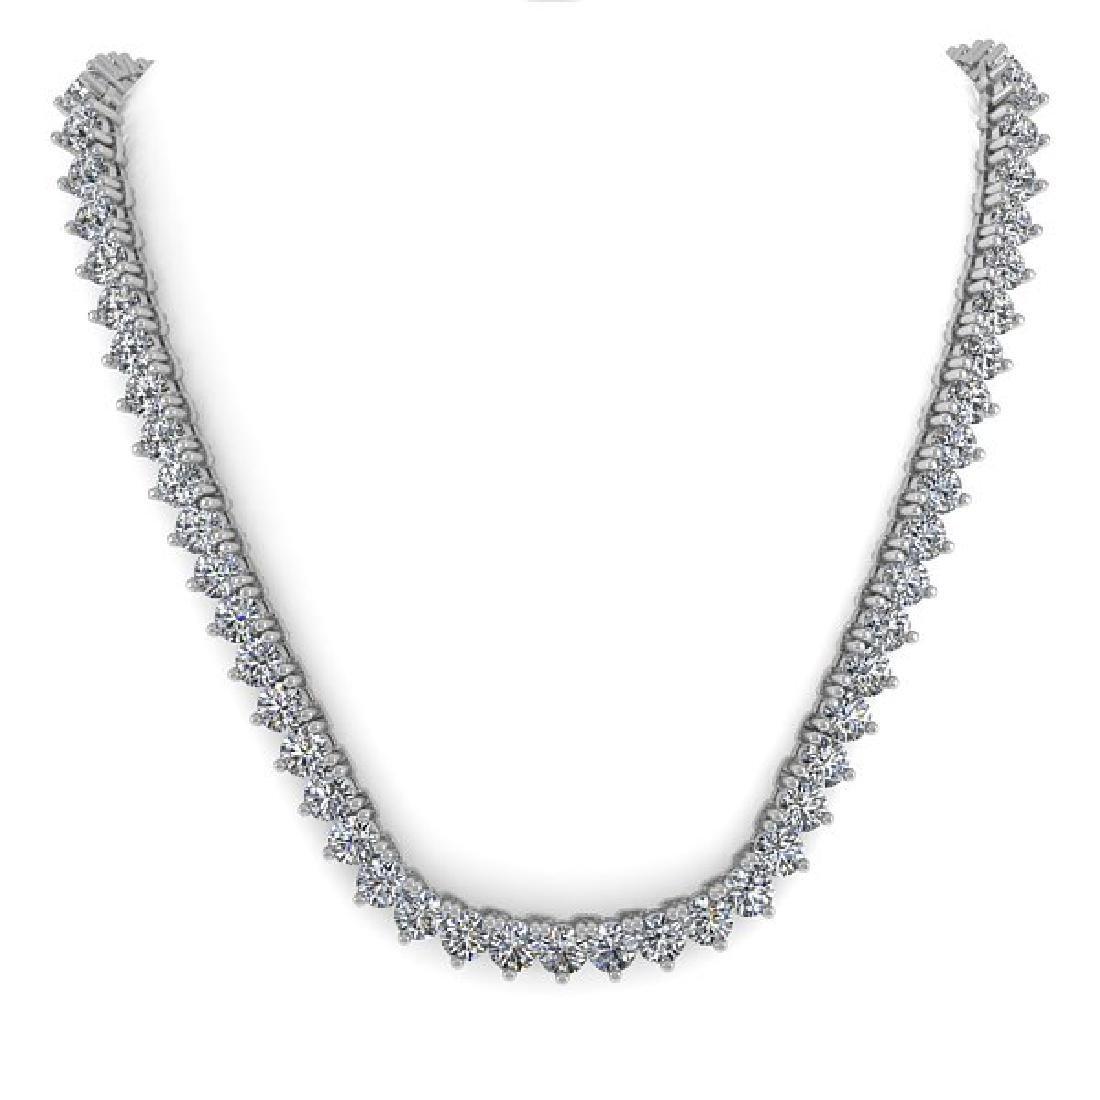 20 CTW Solitaire VS/SI Diamond Necklace 14K White Gold - 3